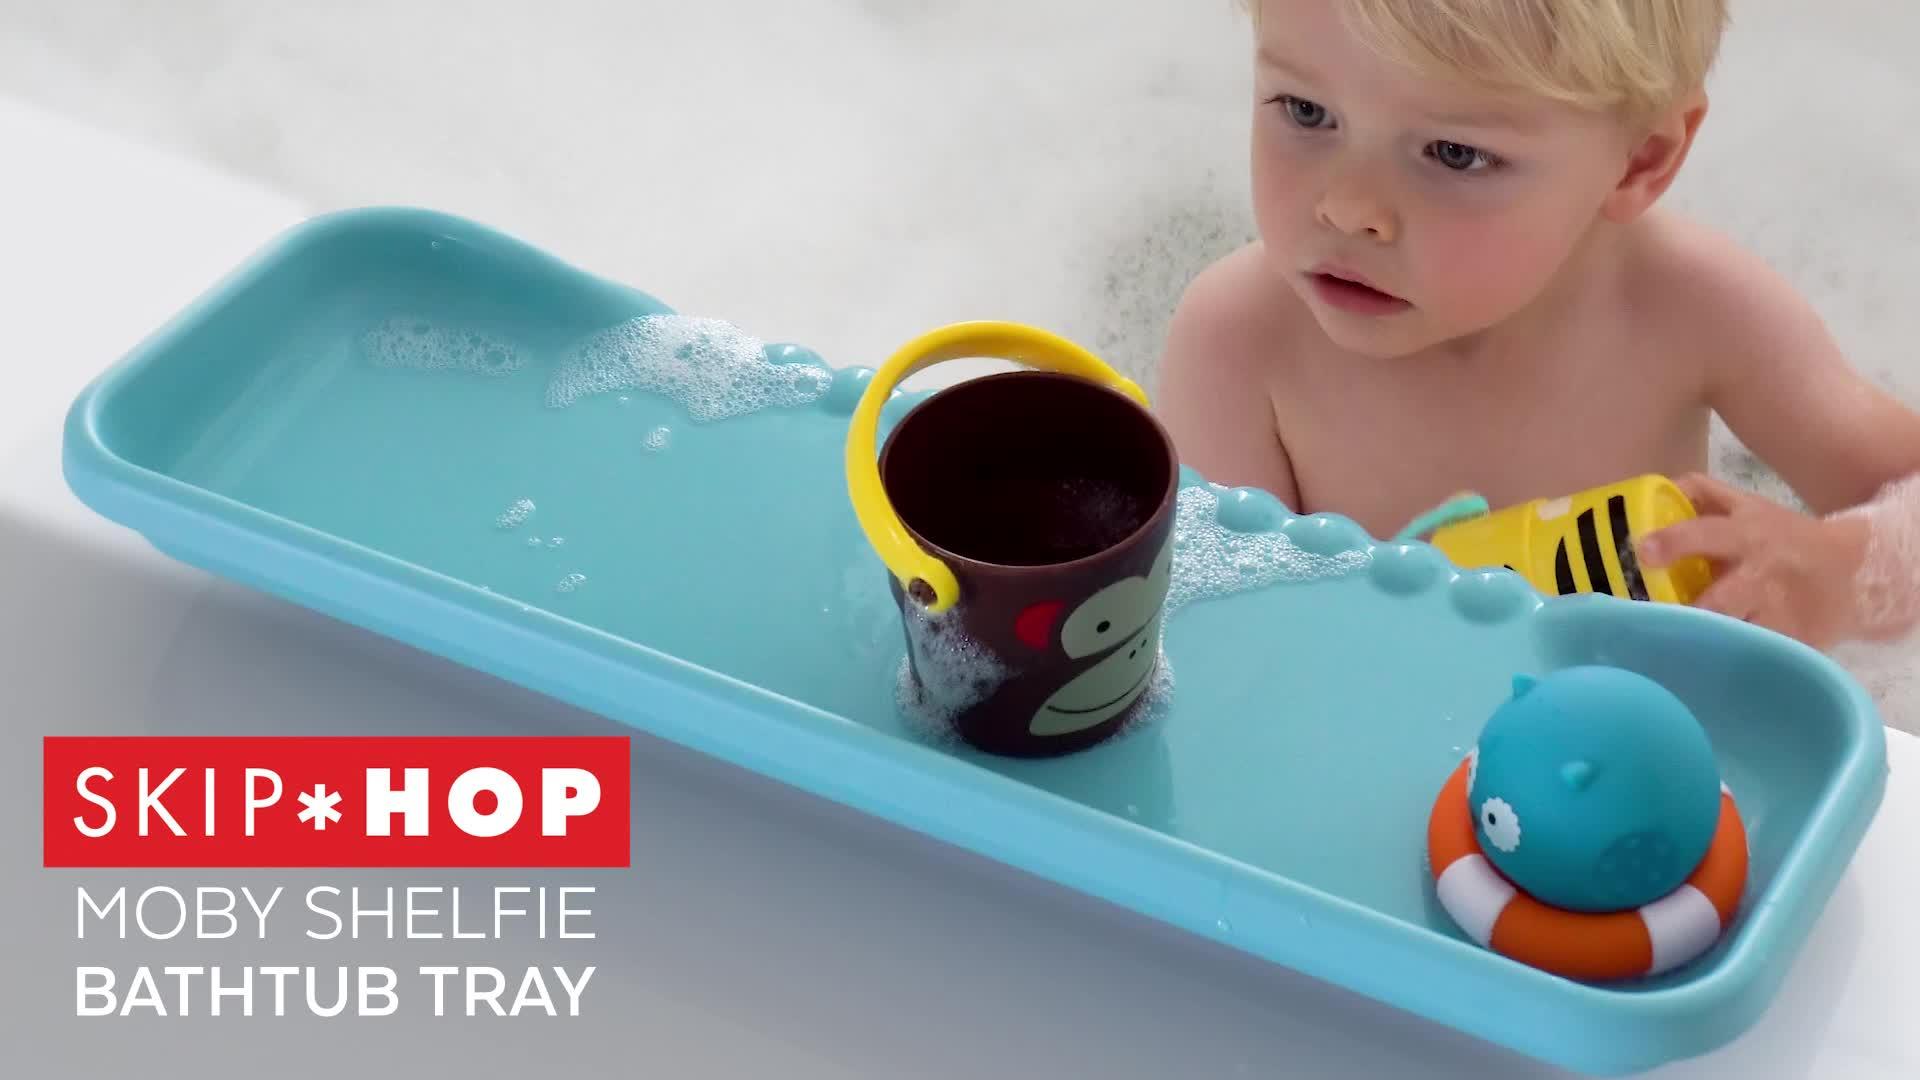 nonslip moby hop ebay whale mats p safety bath blue kids baby mat toddler s skip